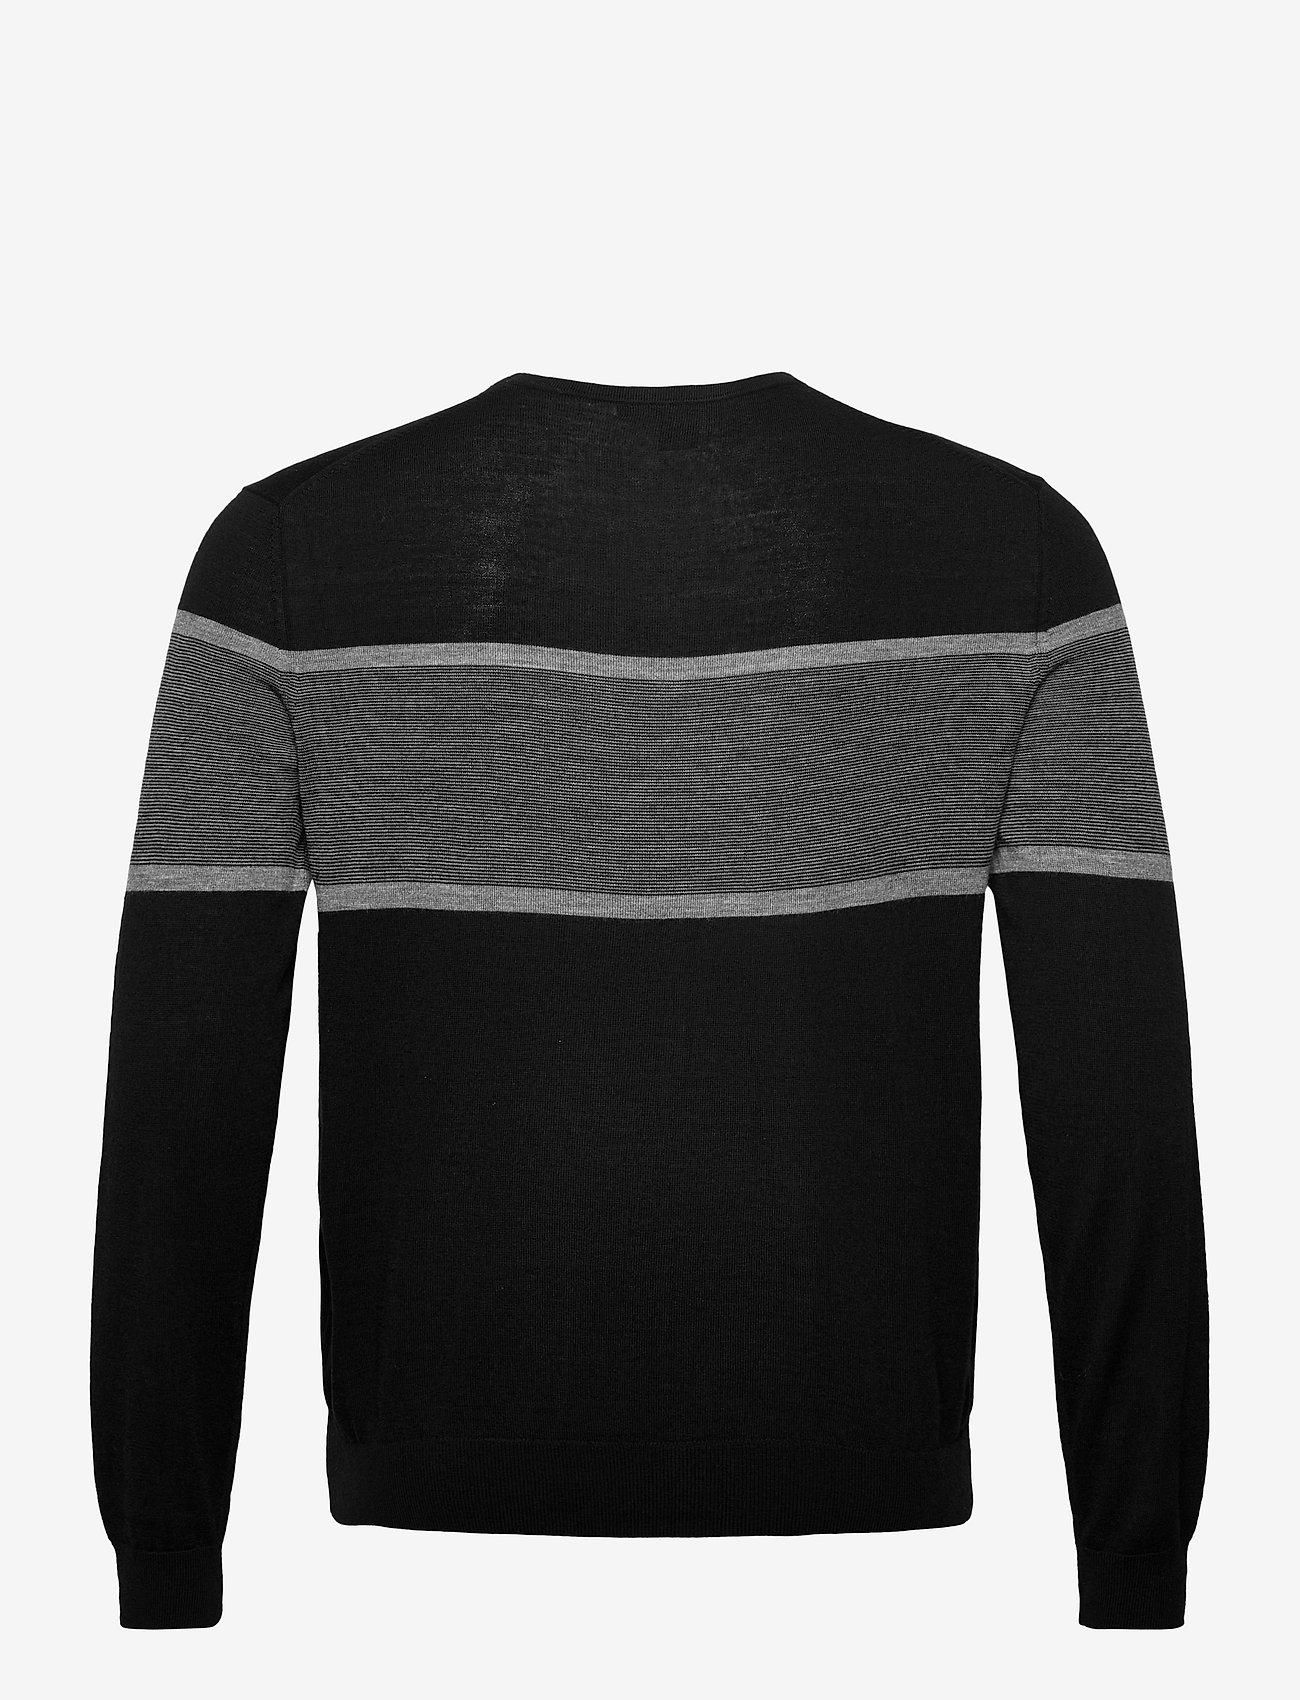 Banana Republic - Merino Stripe Sweater in Responsible Wool - knitted round necks - black - 1